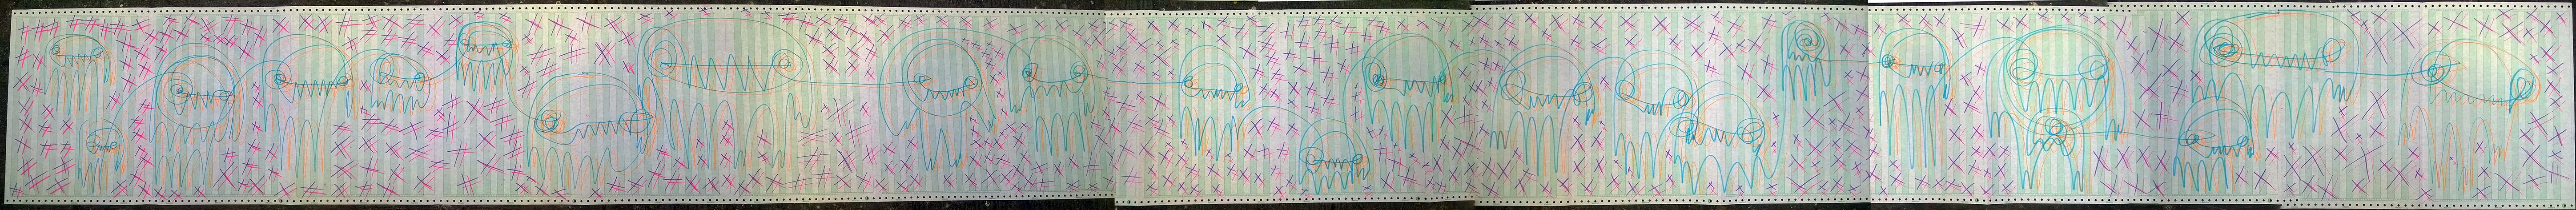 Javier_González_Pigsucker_Dimensiones_Variables_Marcador_38_x_504_cm_$1,040.00